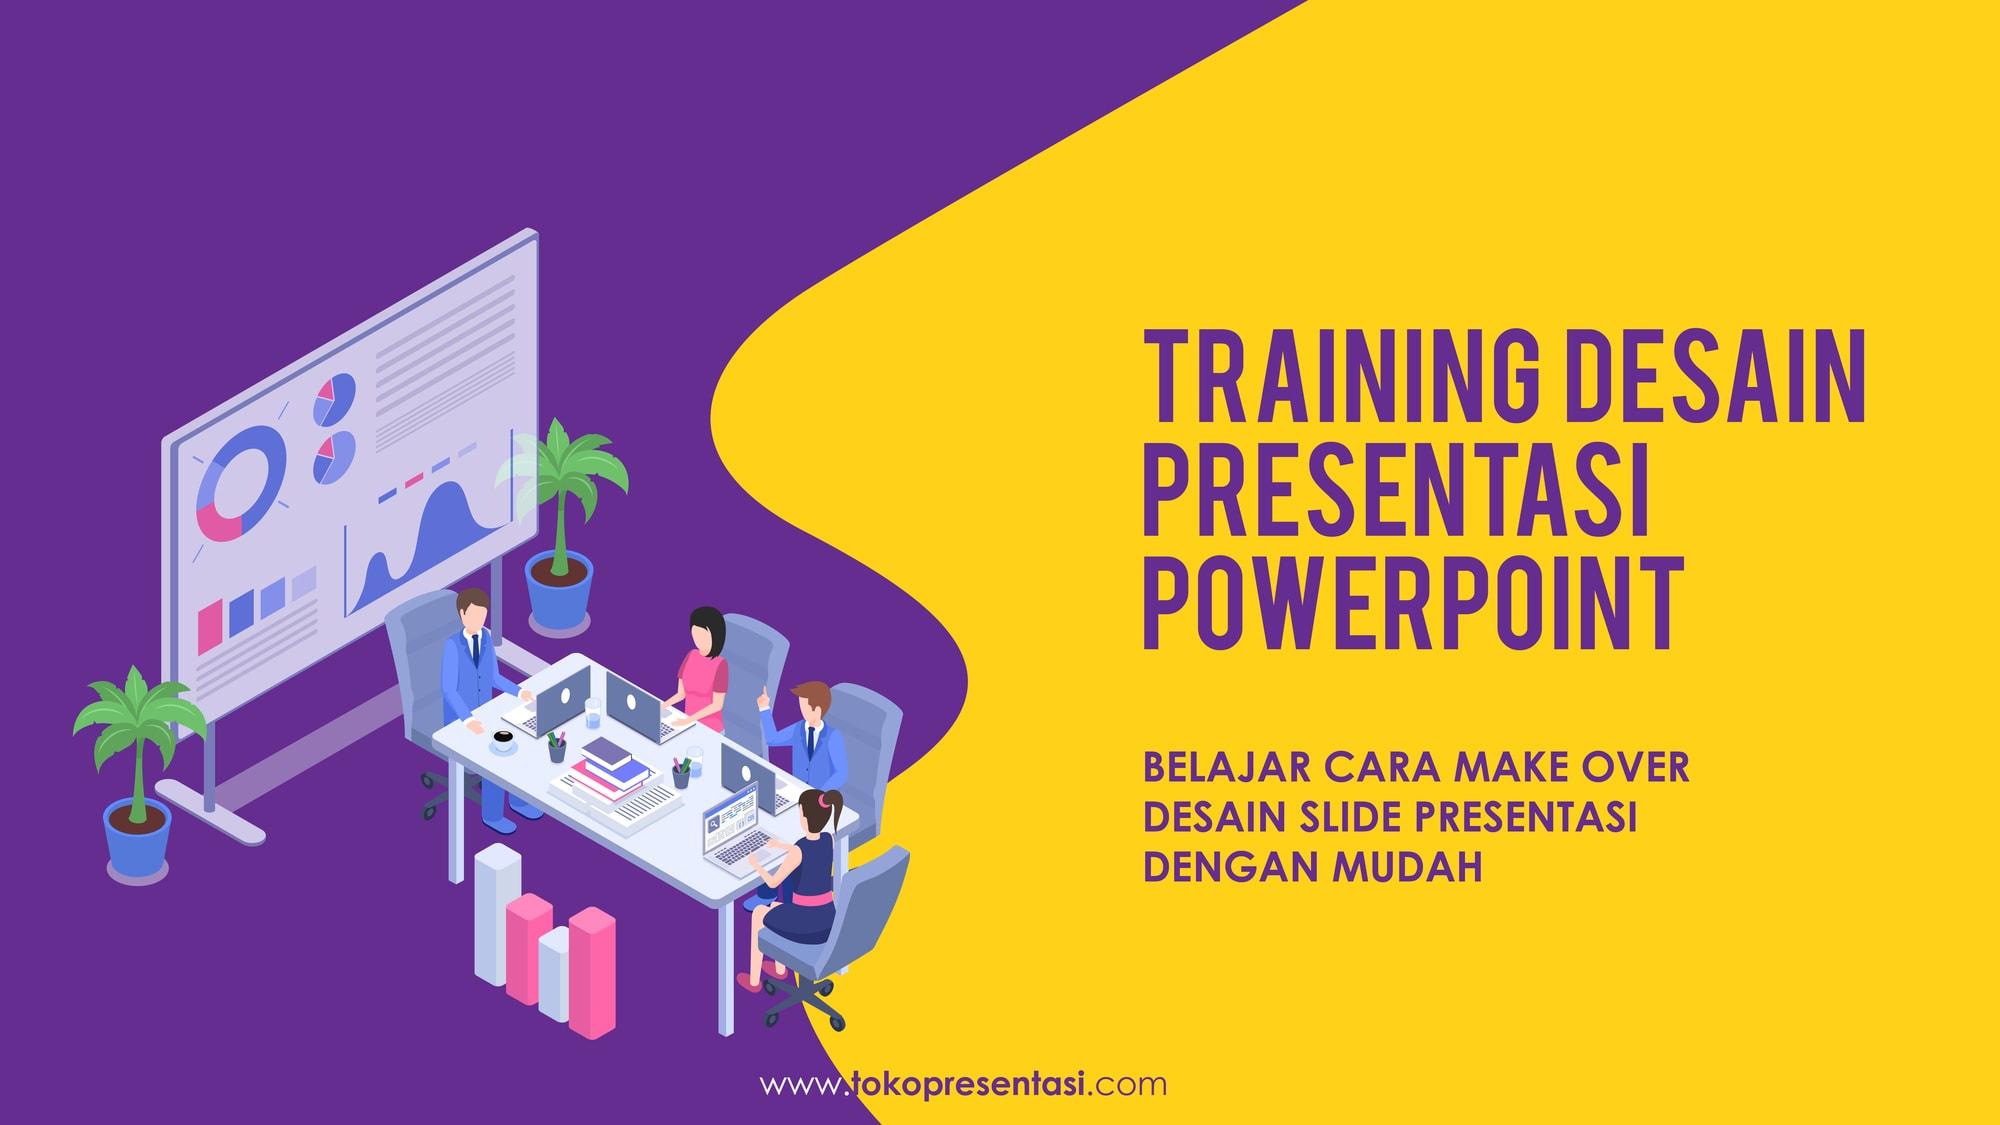 Pelatihan Desain Presentasi PowerPoint Pertamina Corporate University Tokopresentasi